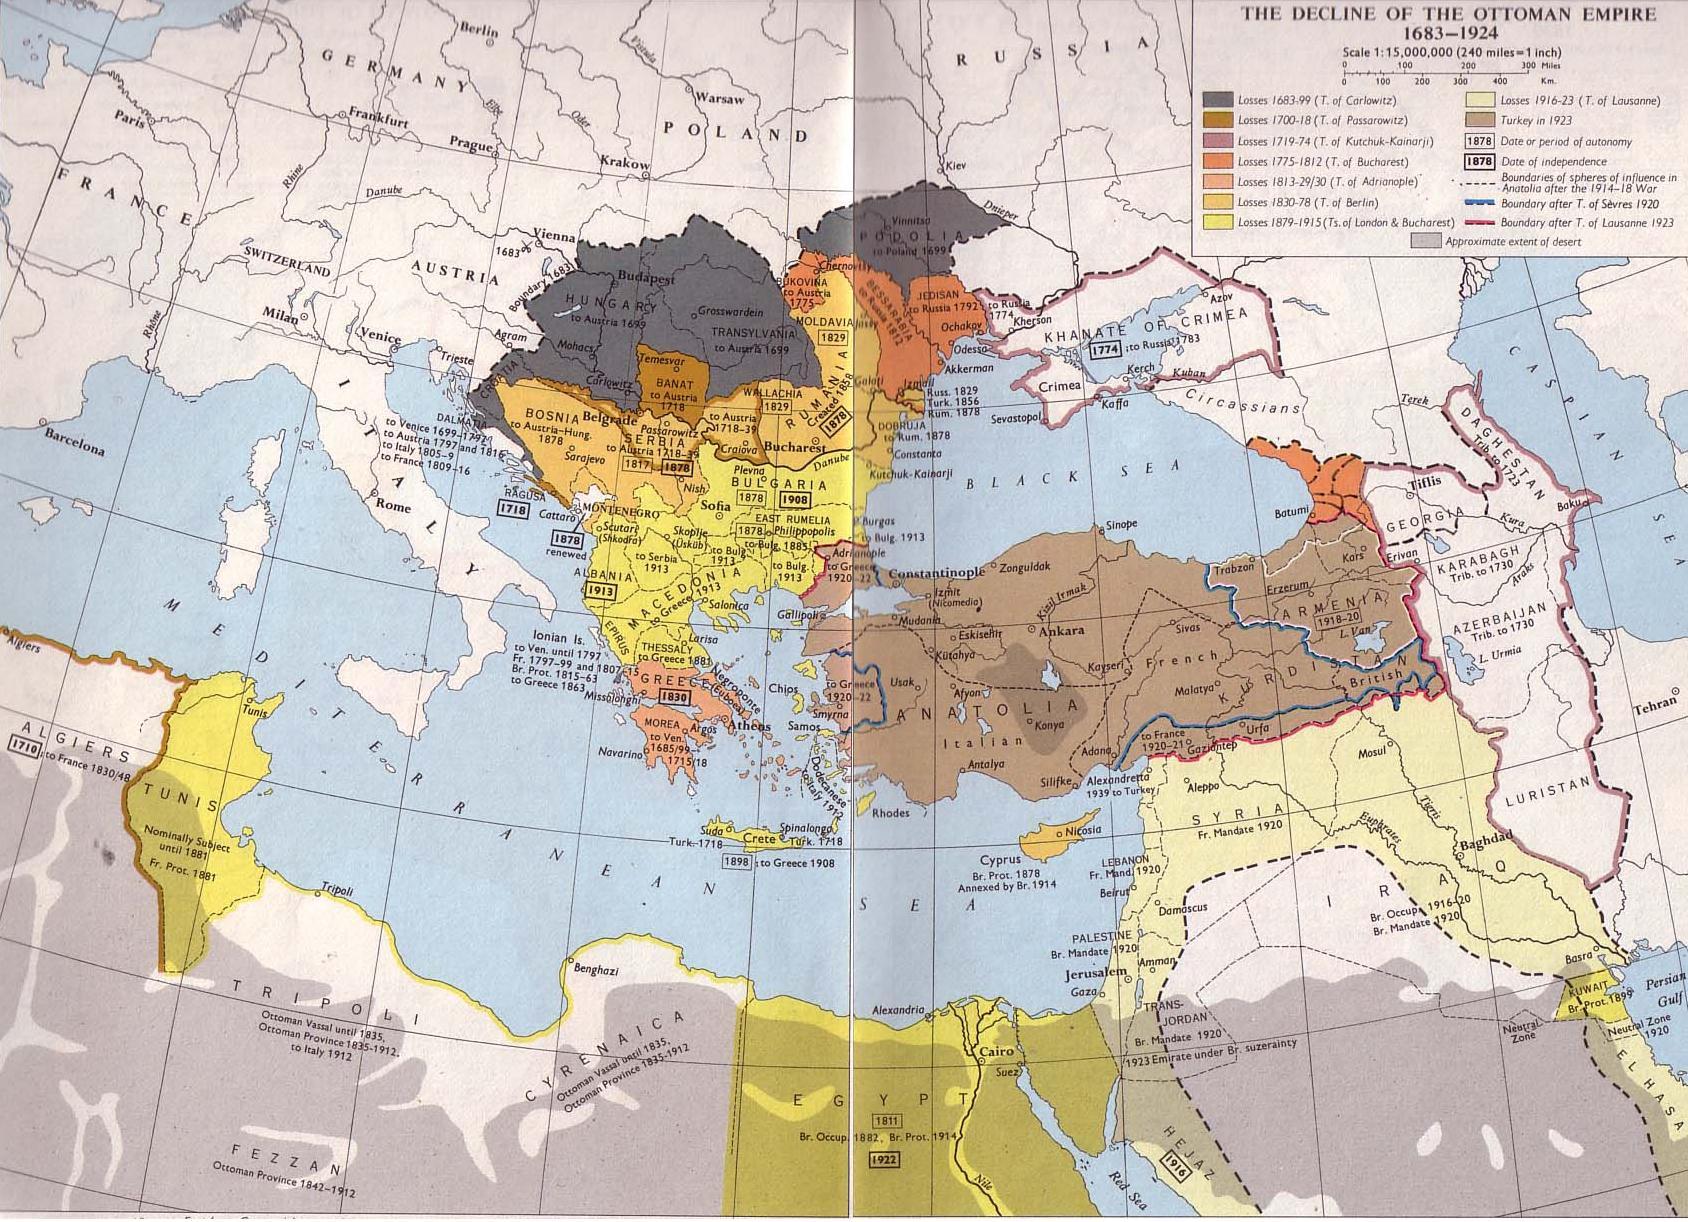 Decadencia del Imperio Otomano 1683-1924